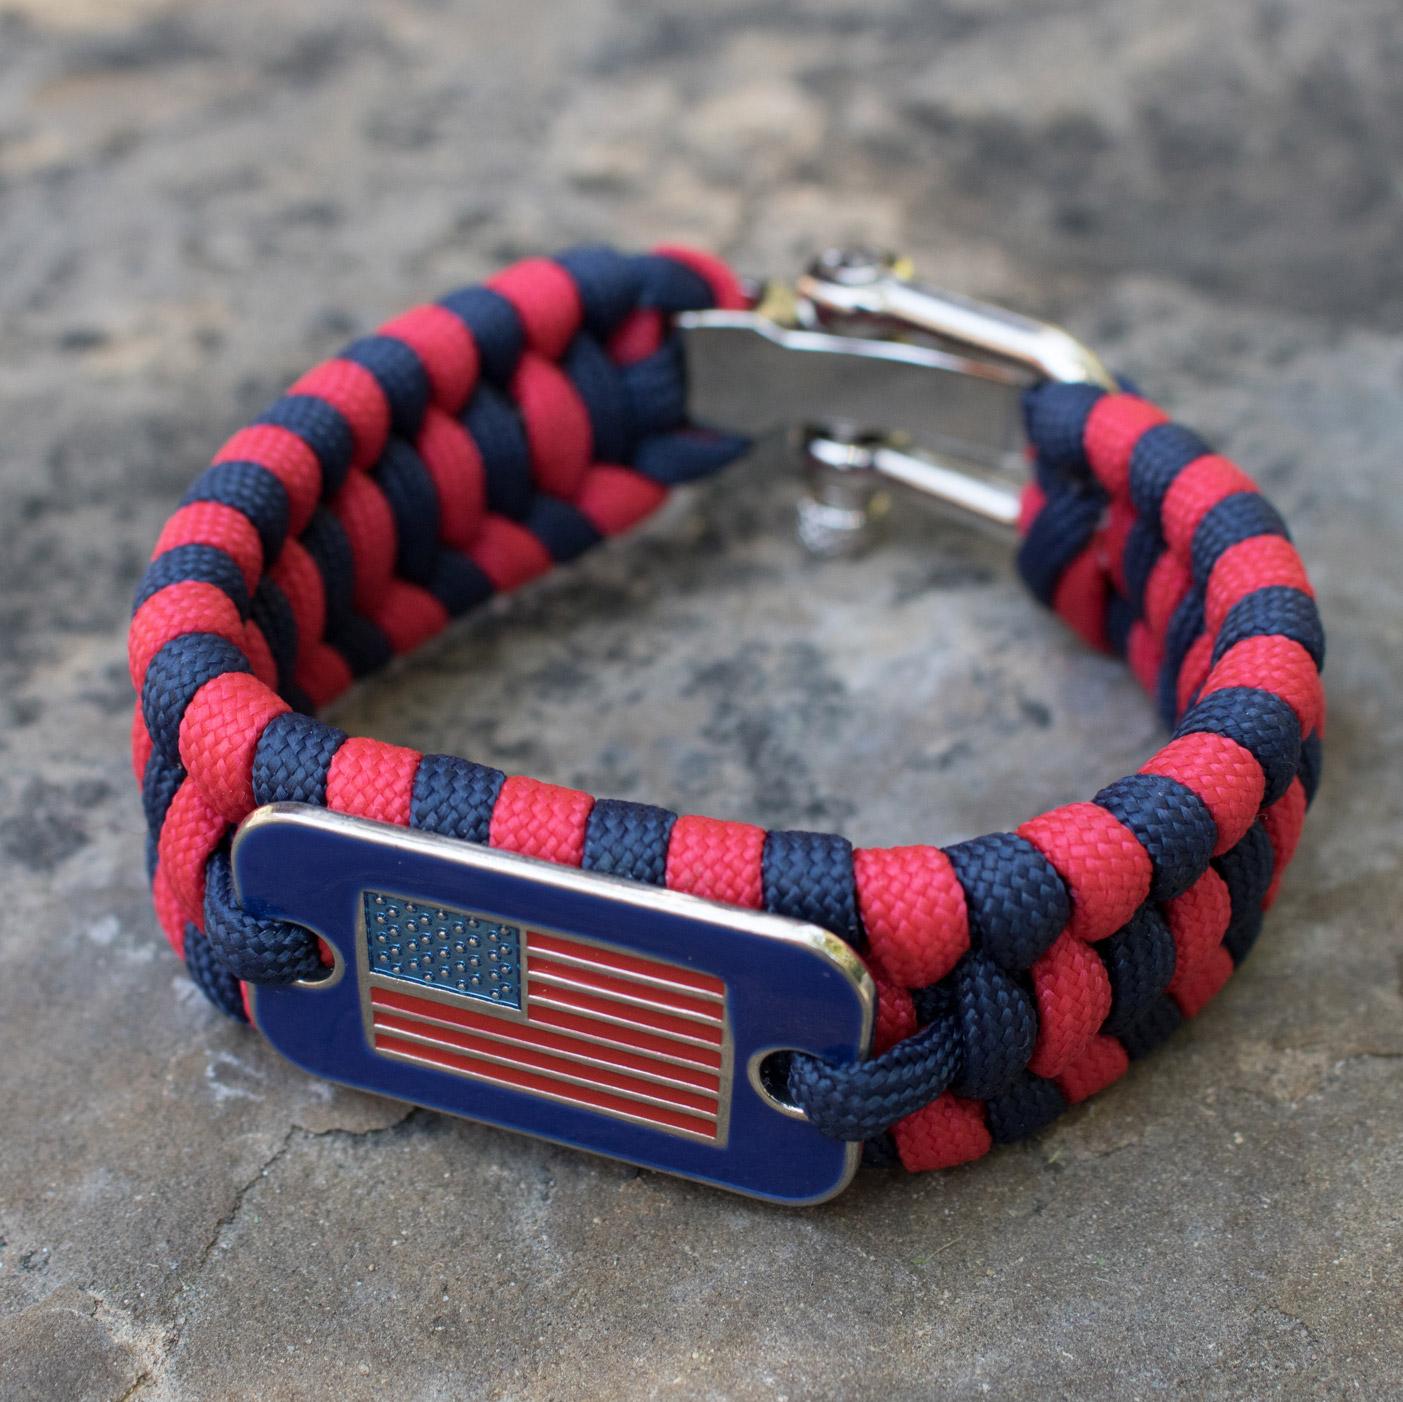 Paracord Survival Flag Bracelet Helps Pair Veterans With A Service